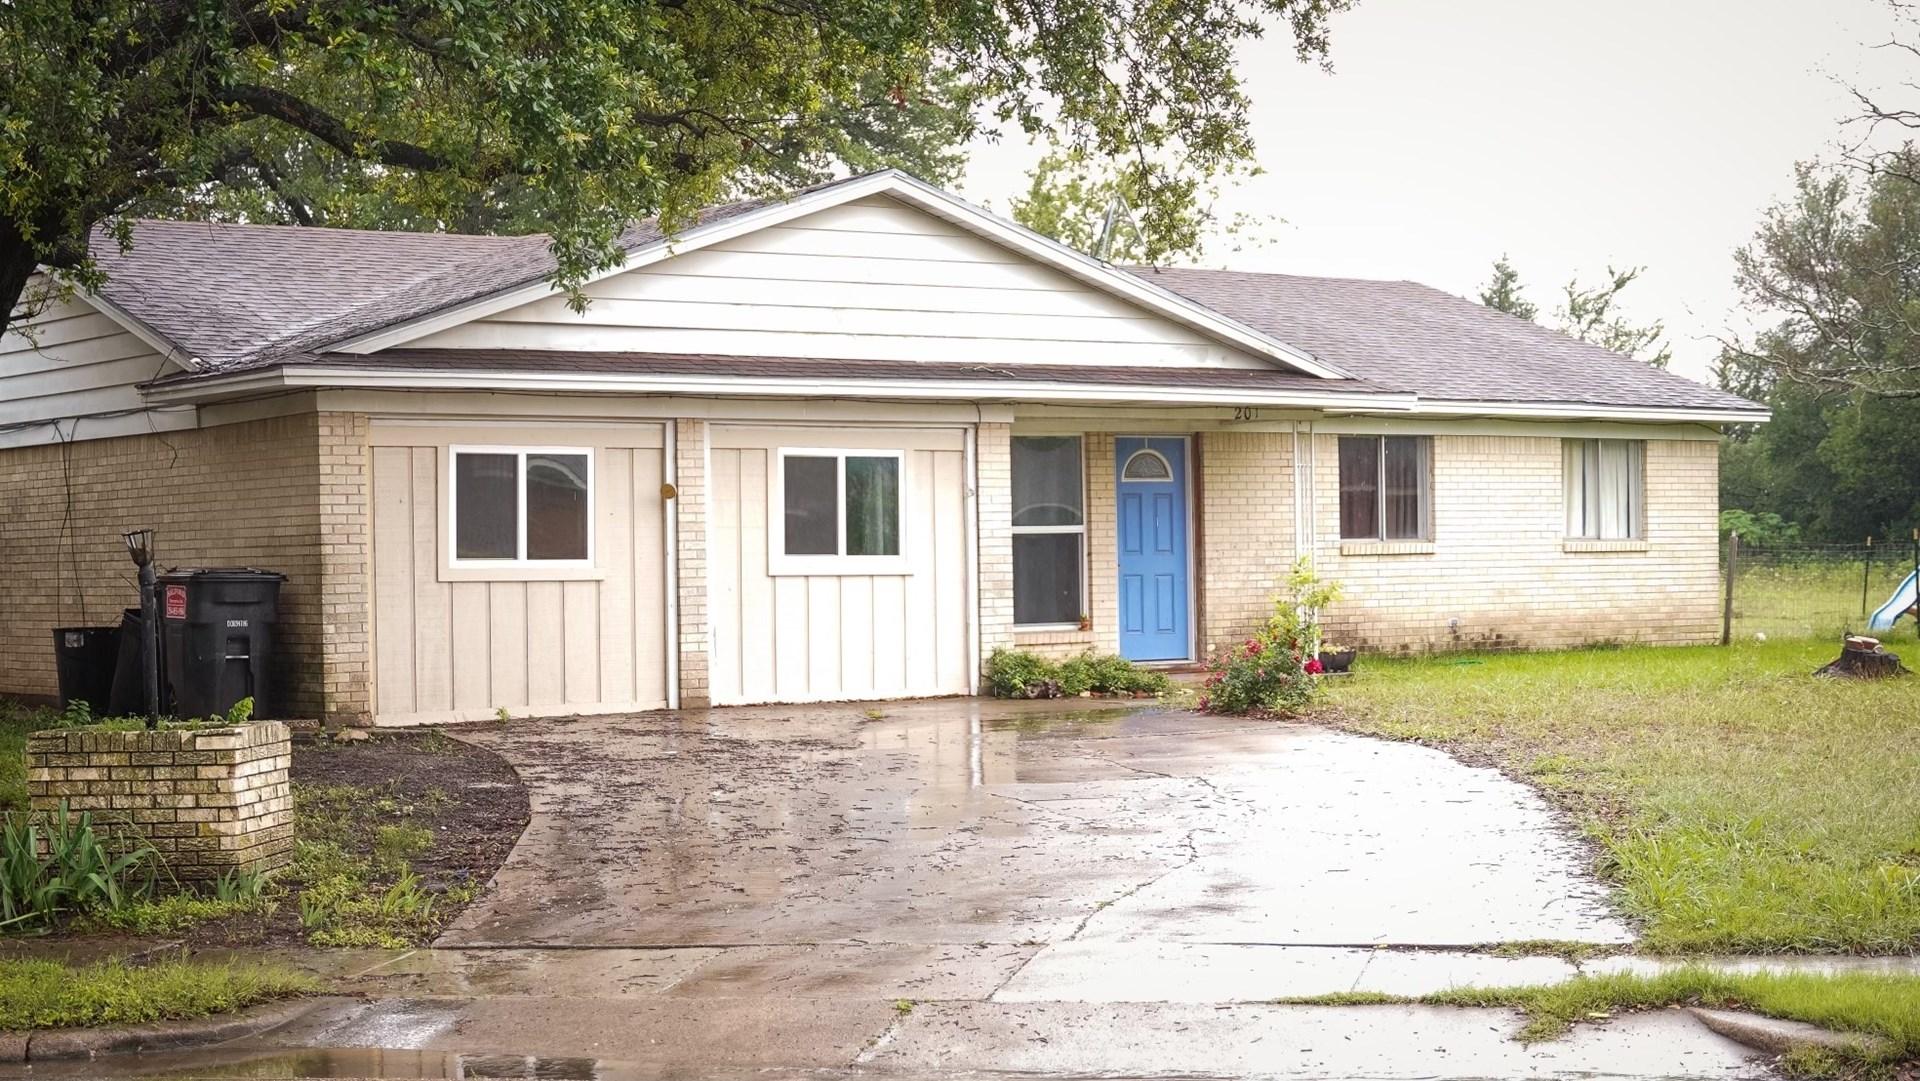 Beautiful home located in  Elm Mott, Texas 76640